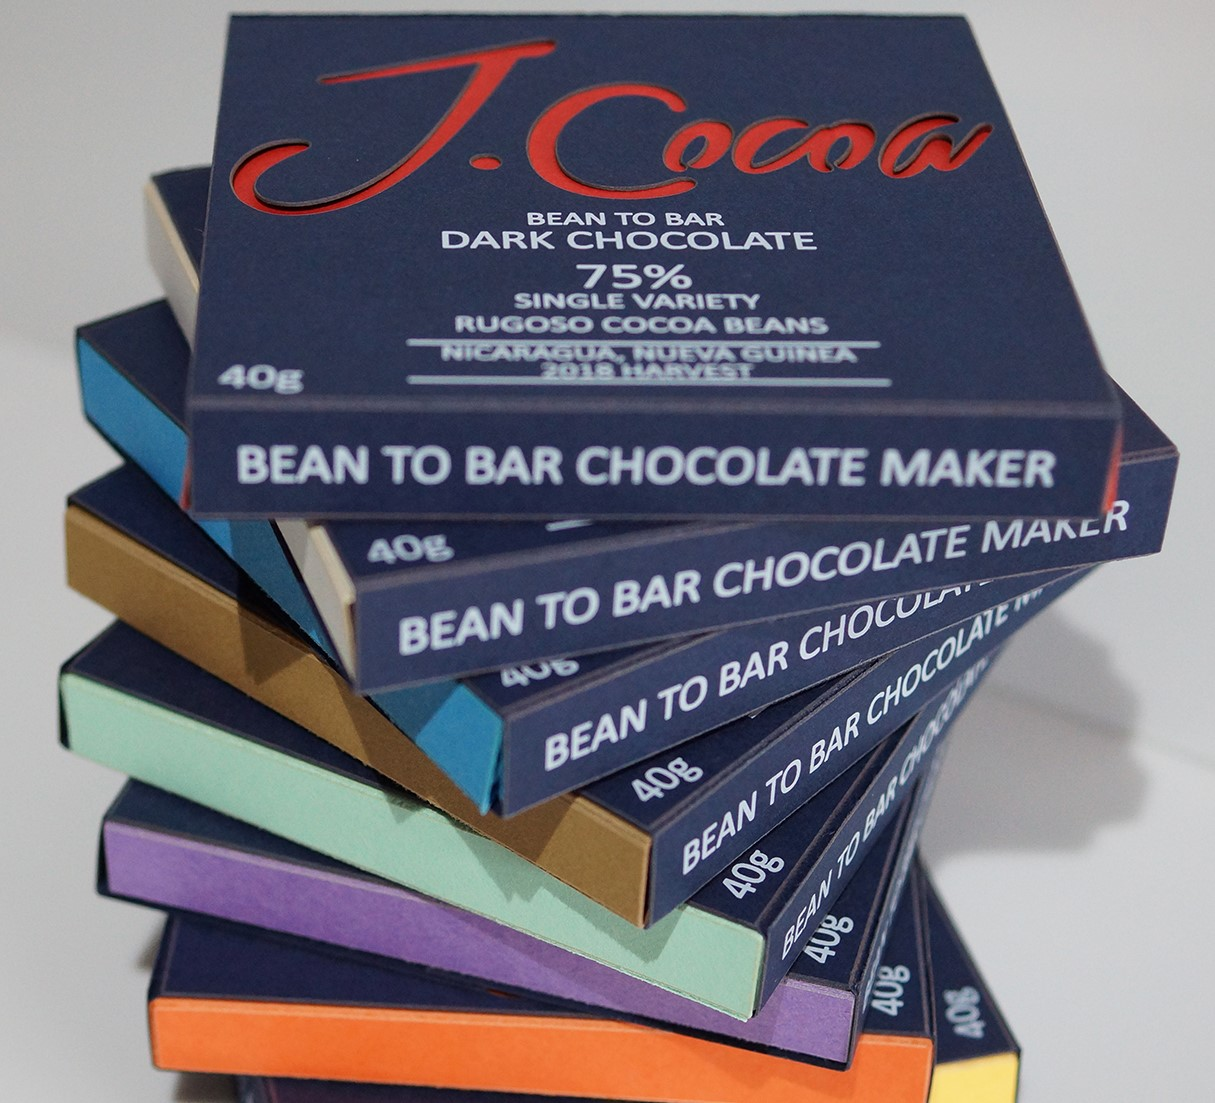 J Cocoa bean to bar chocolate